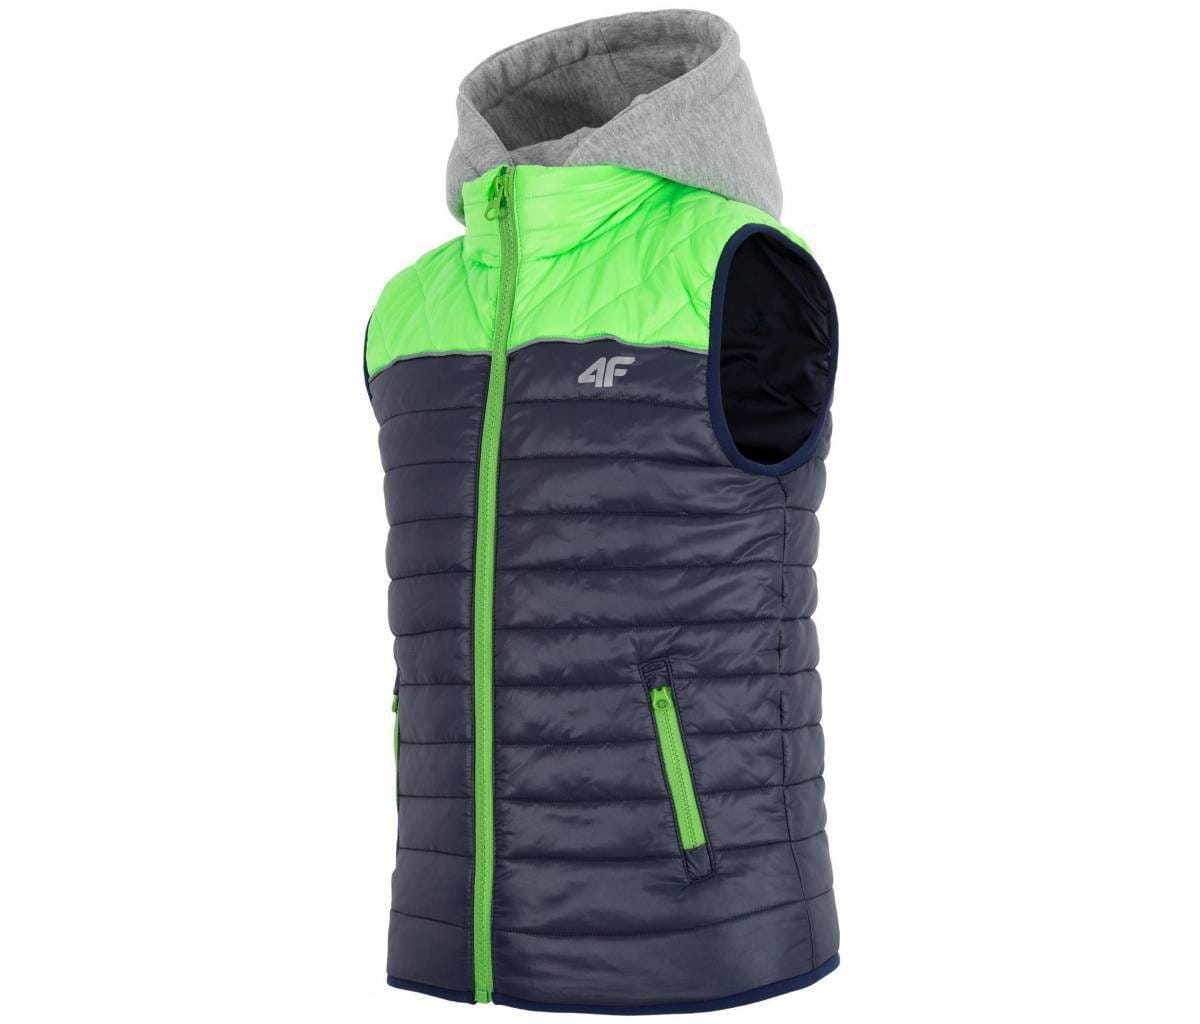 Vesty 4F Boy's vest JKUMB200